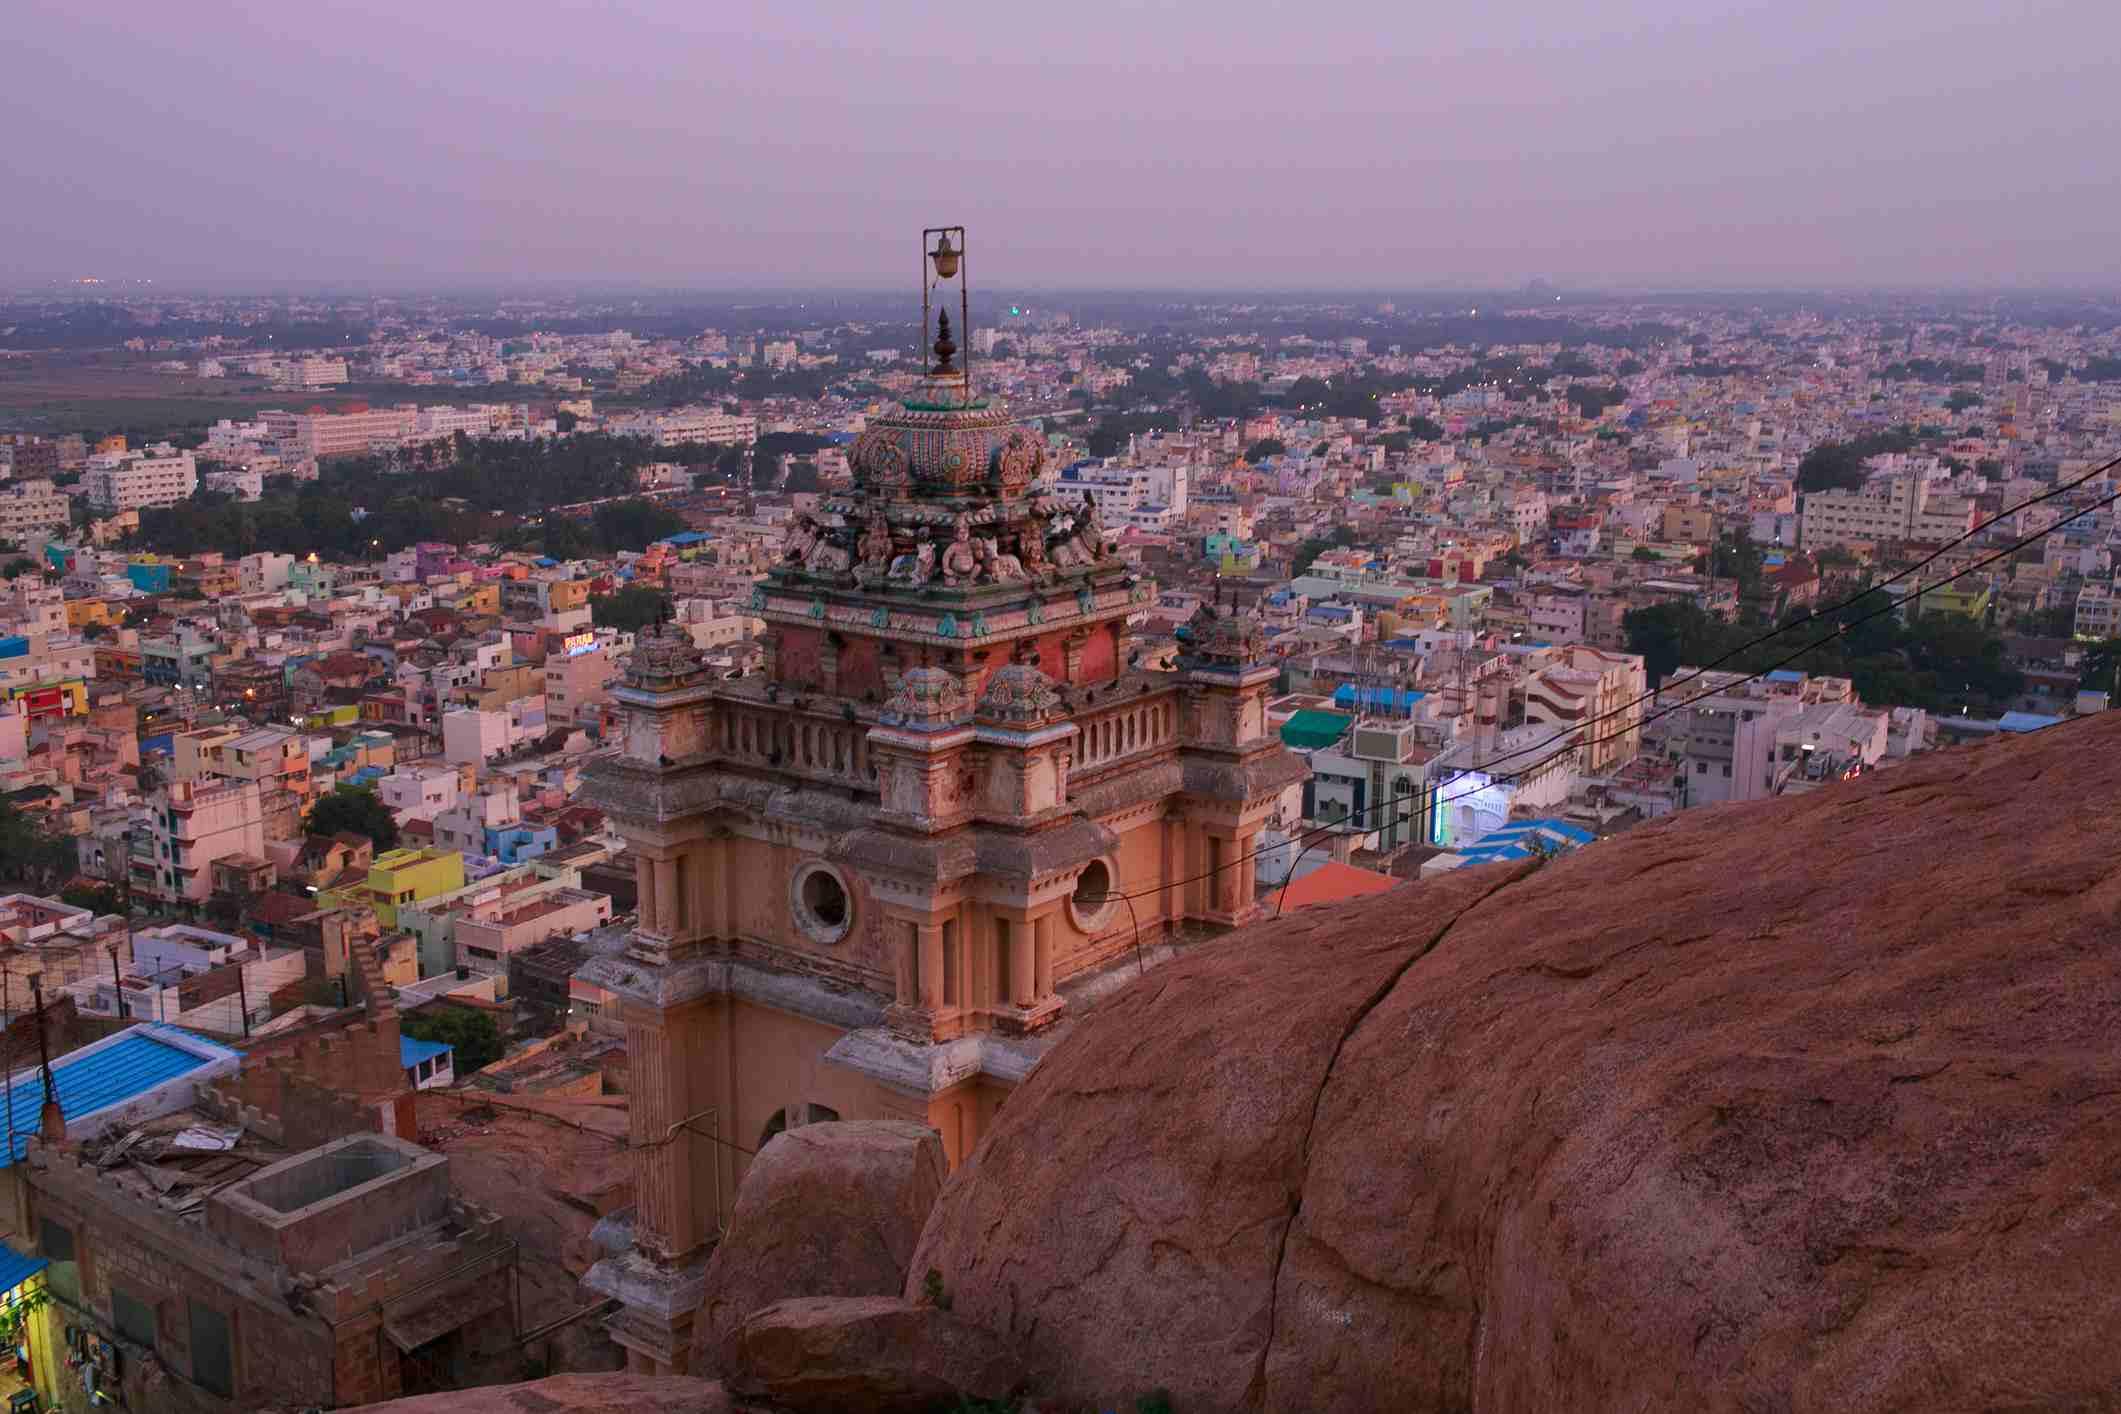 datovania Udaipur Rajasthan